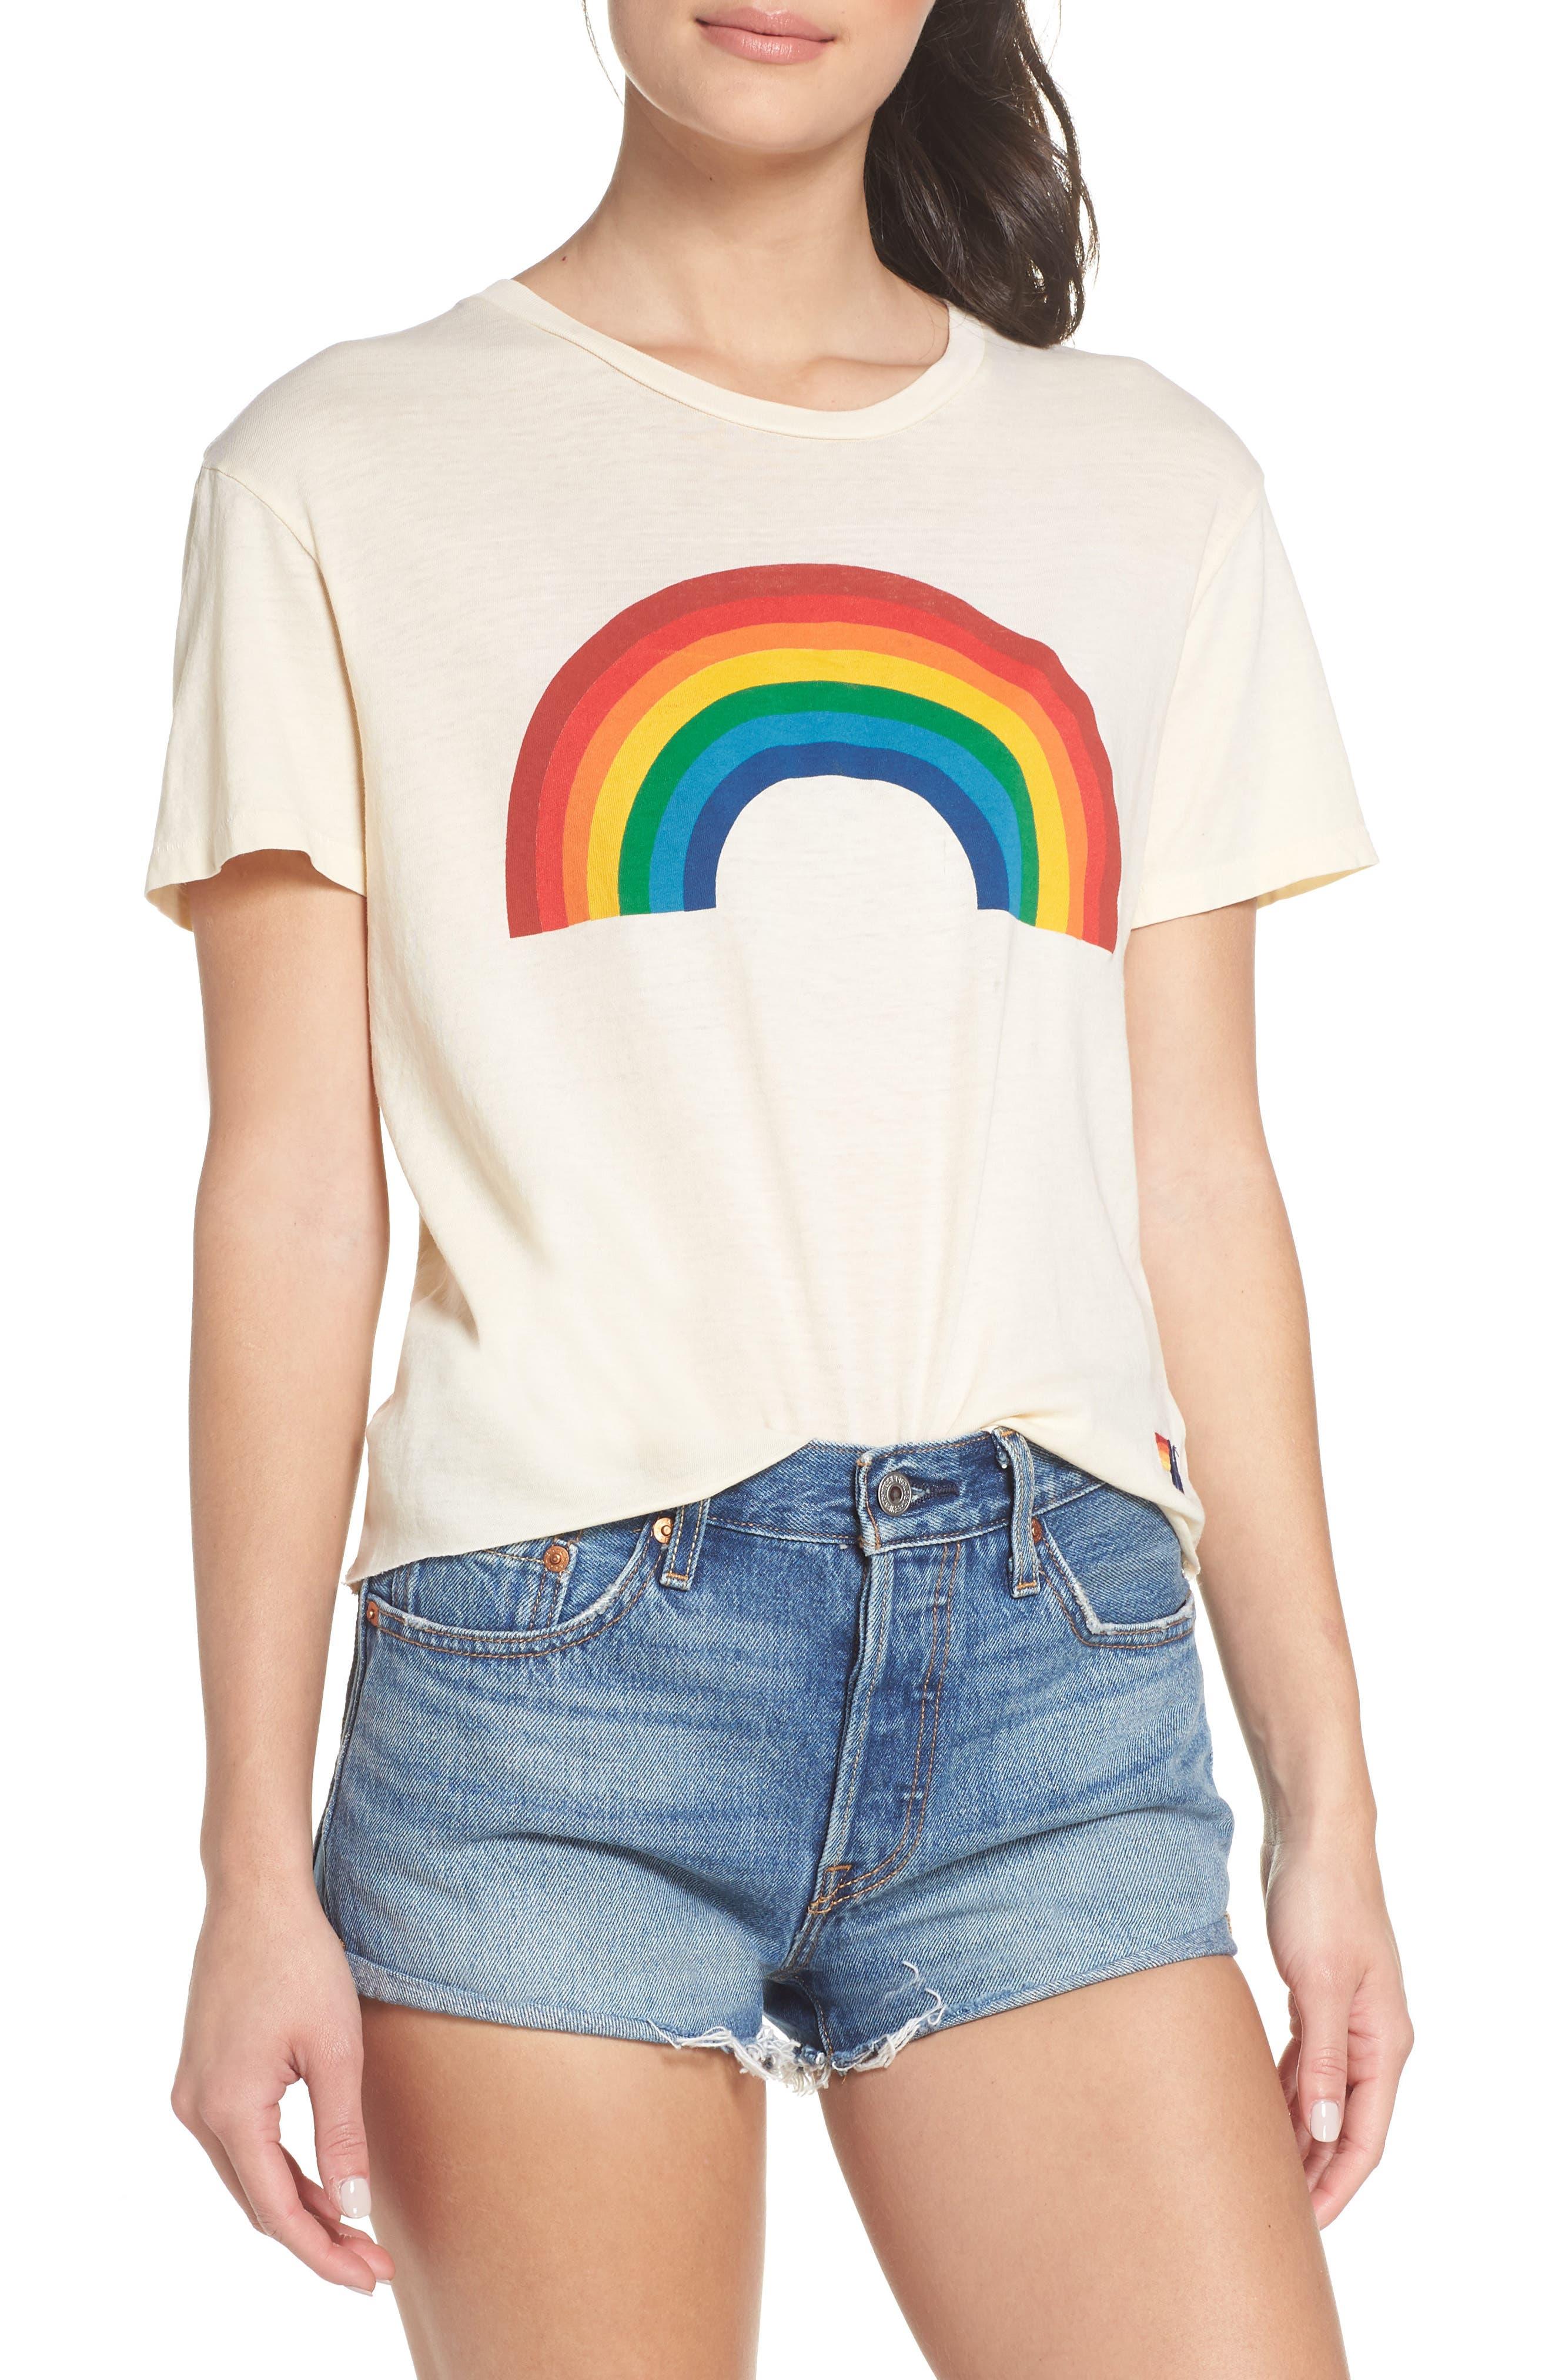 Big Rainbow Boyfriend Tee